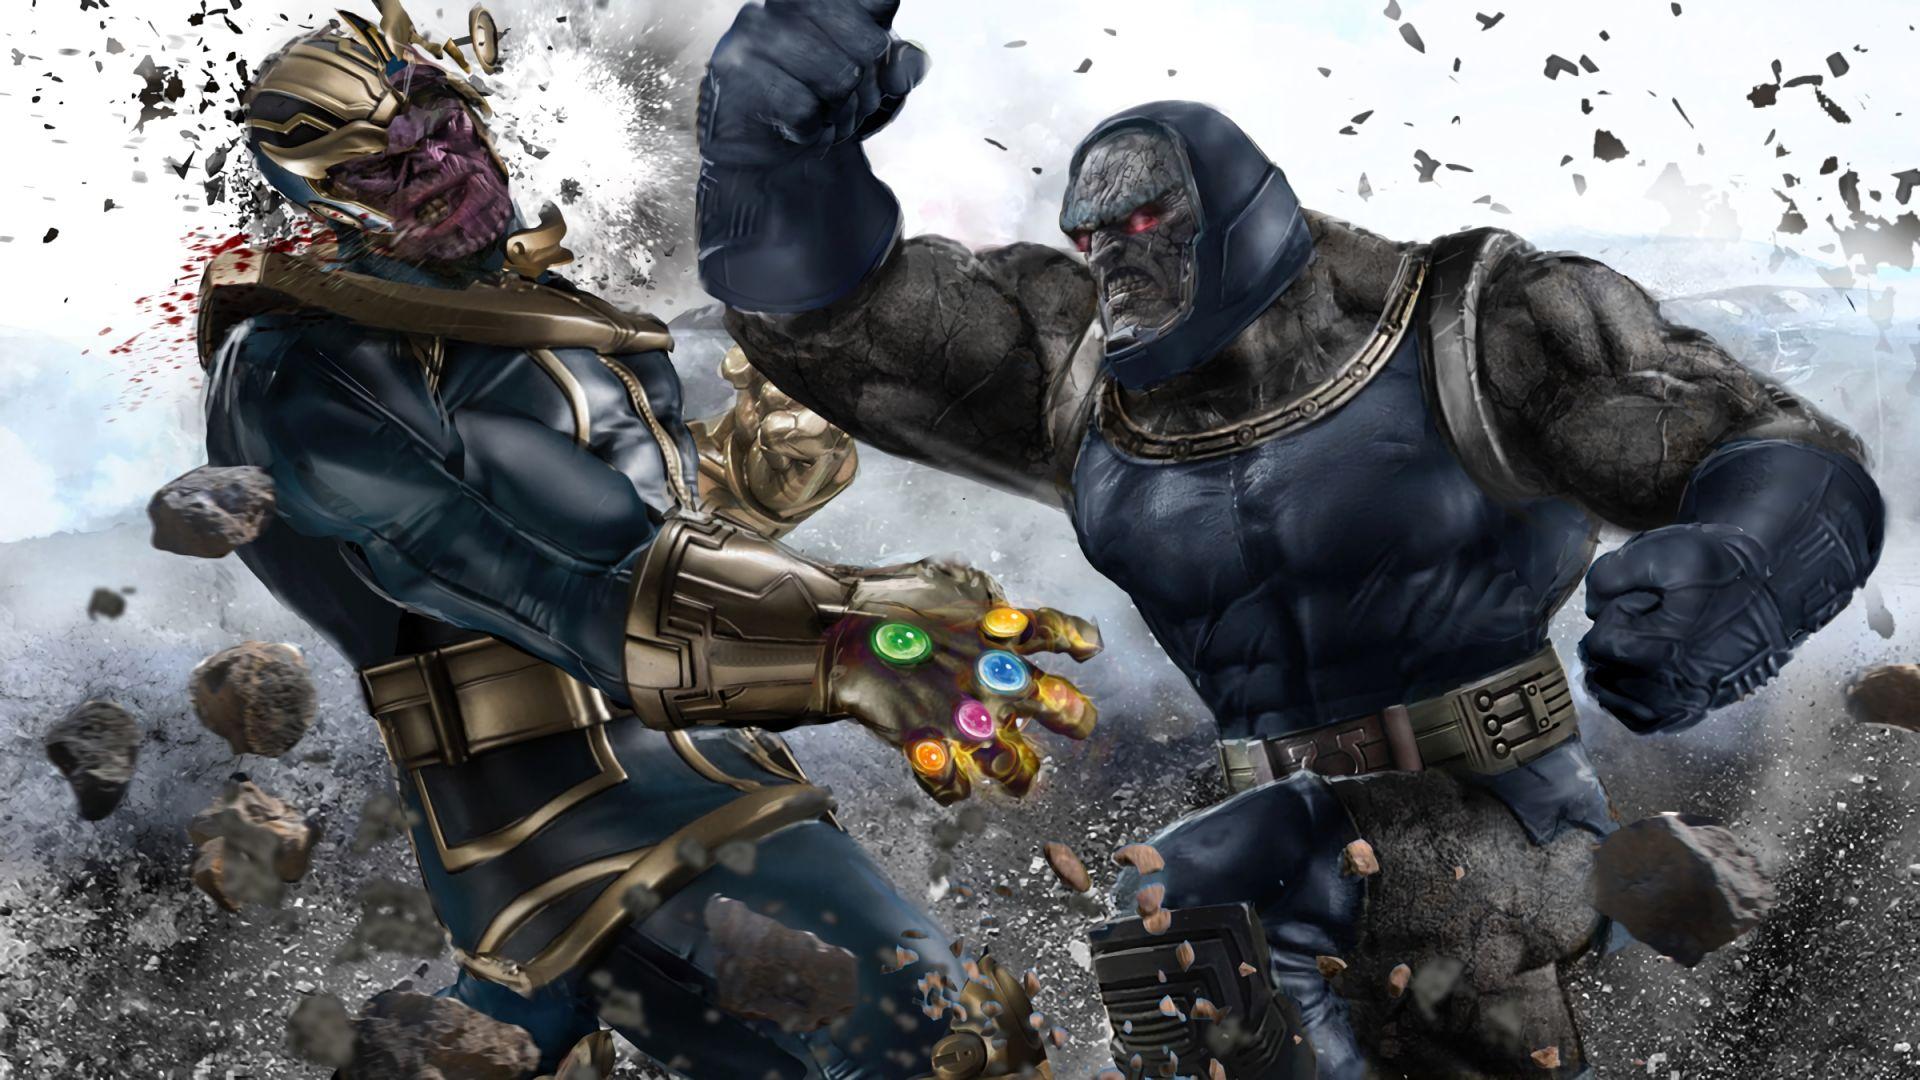 Desktop Wallpaper Darkseid And Thanos Fight Hd Image